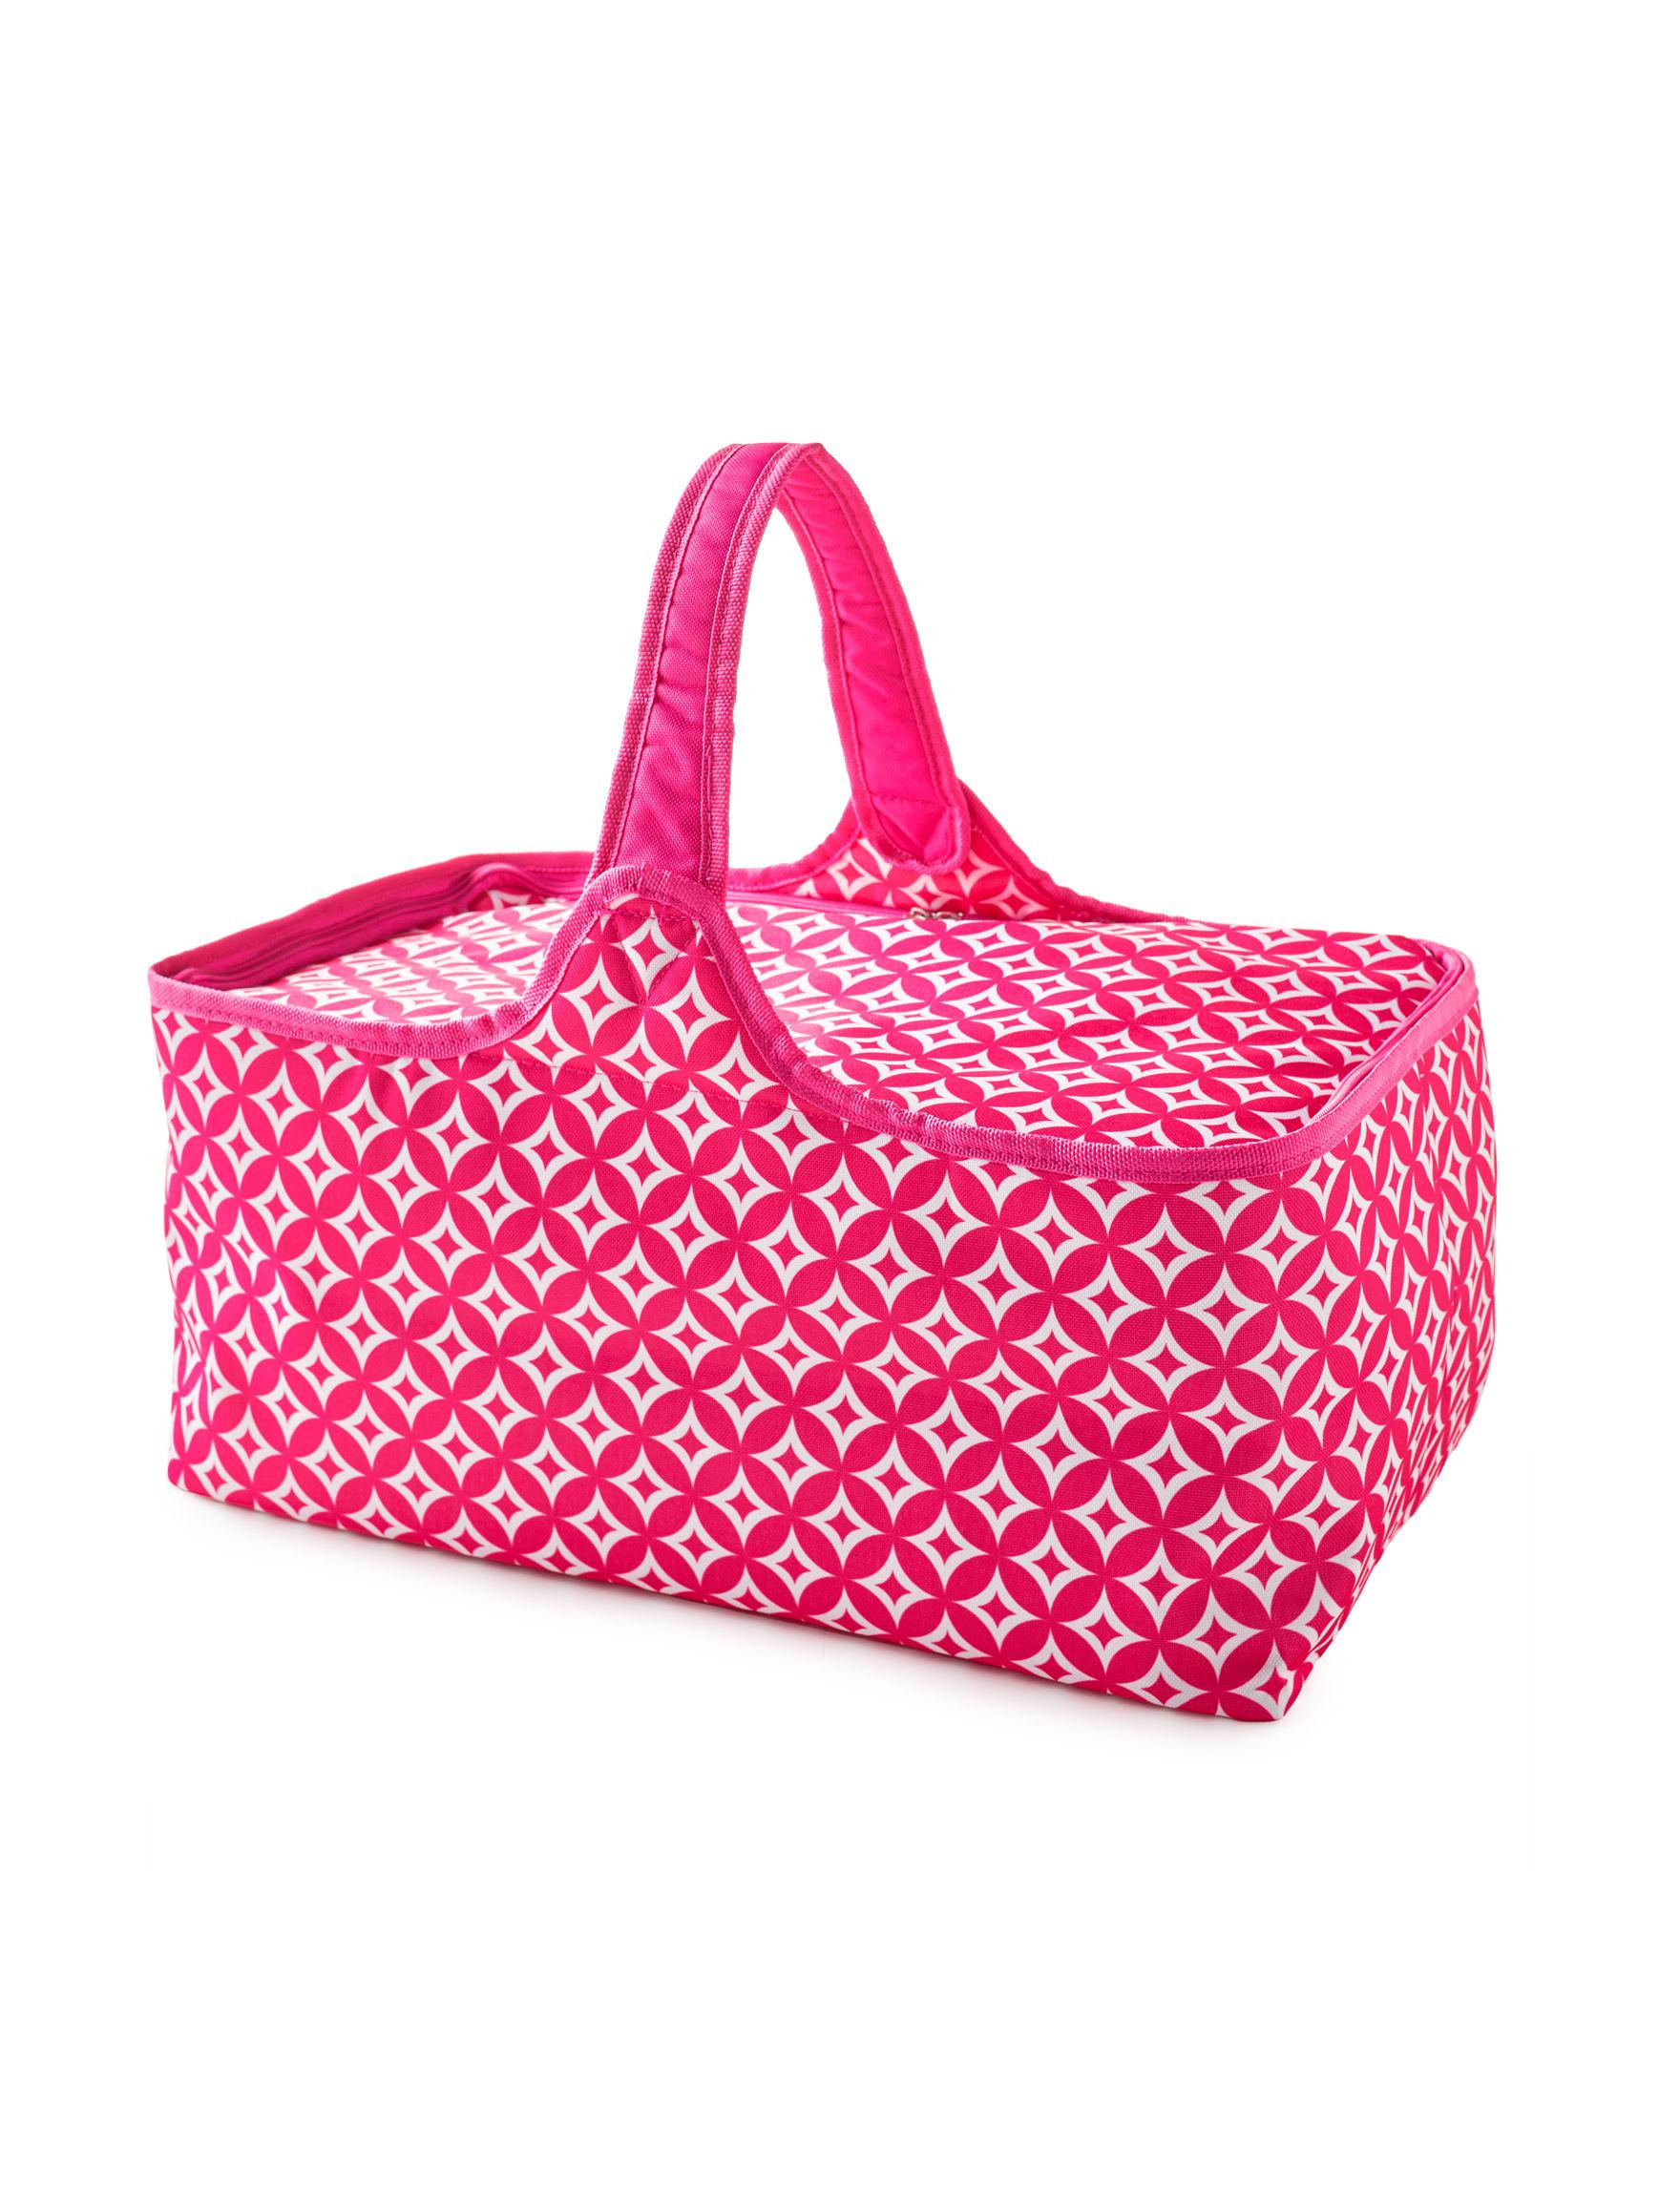 Home Essentials Pink Multi Travel Totes